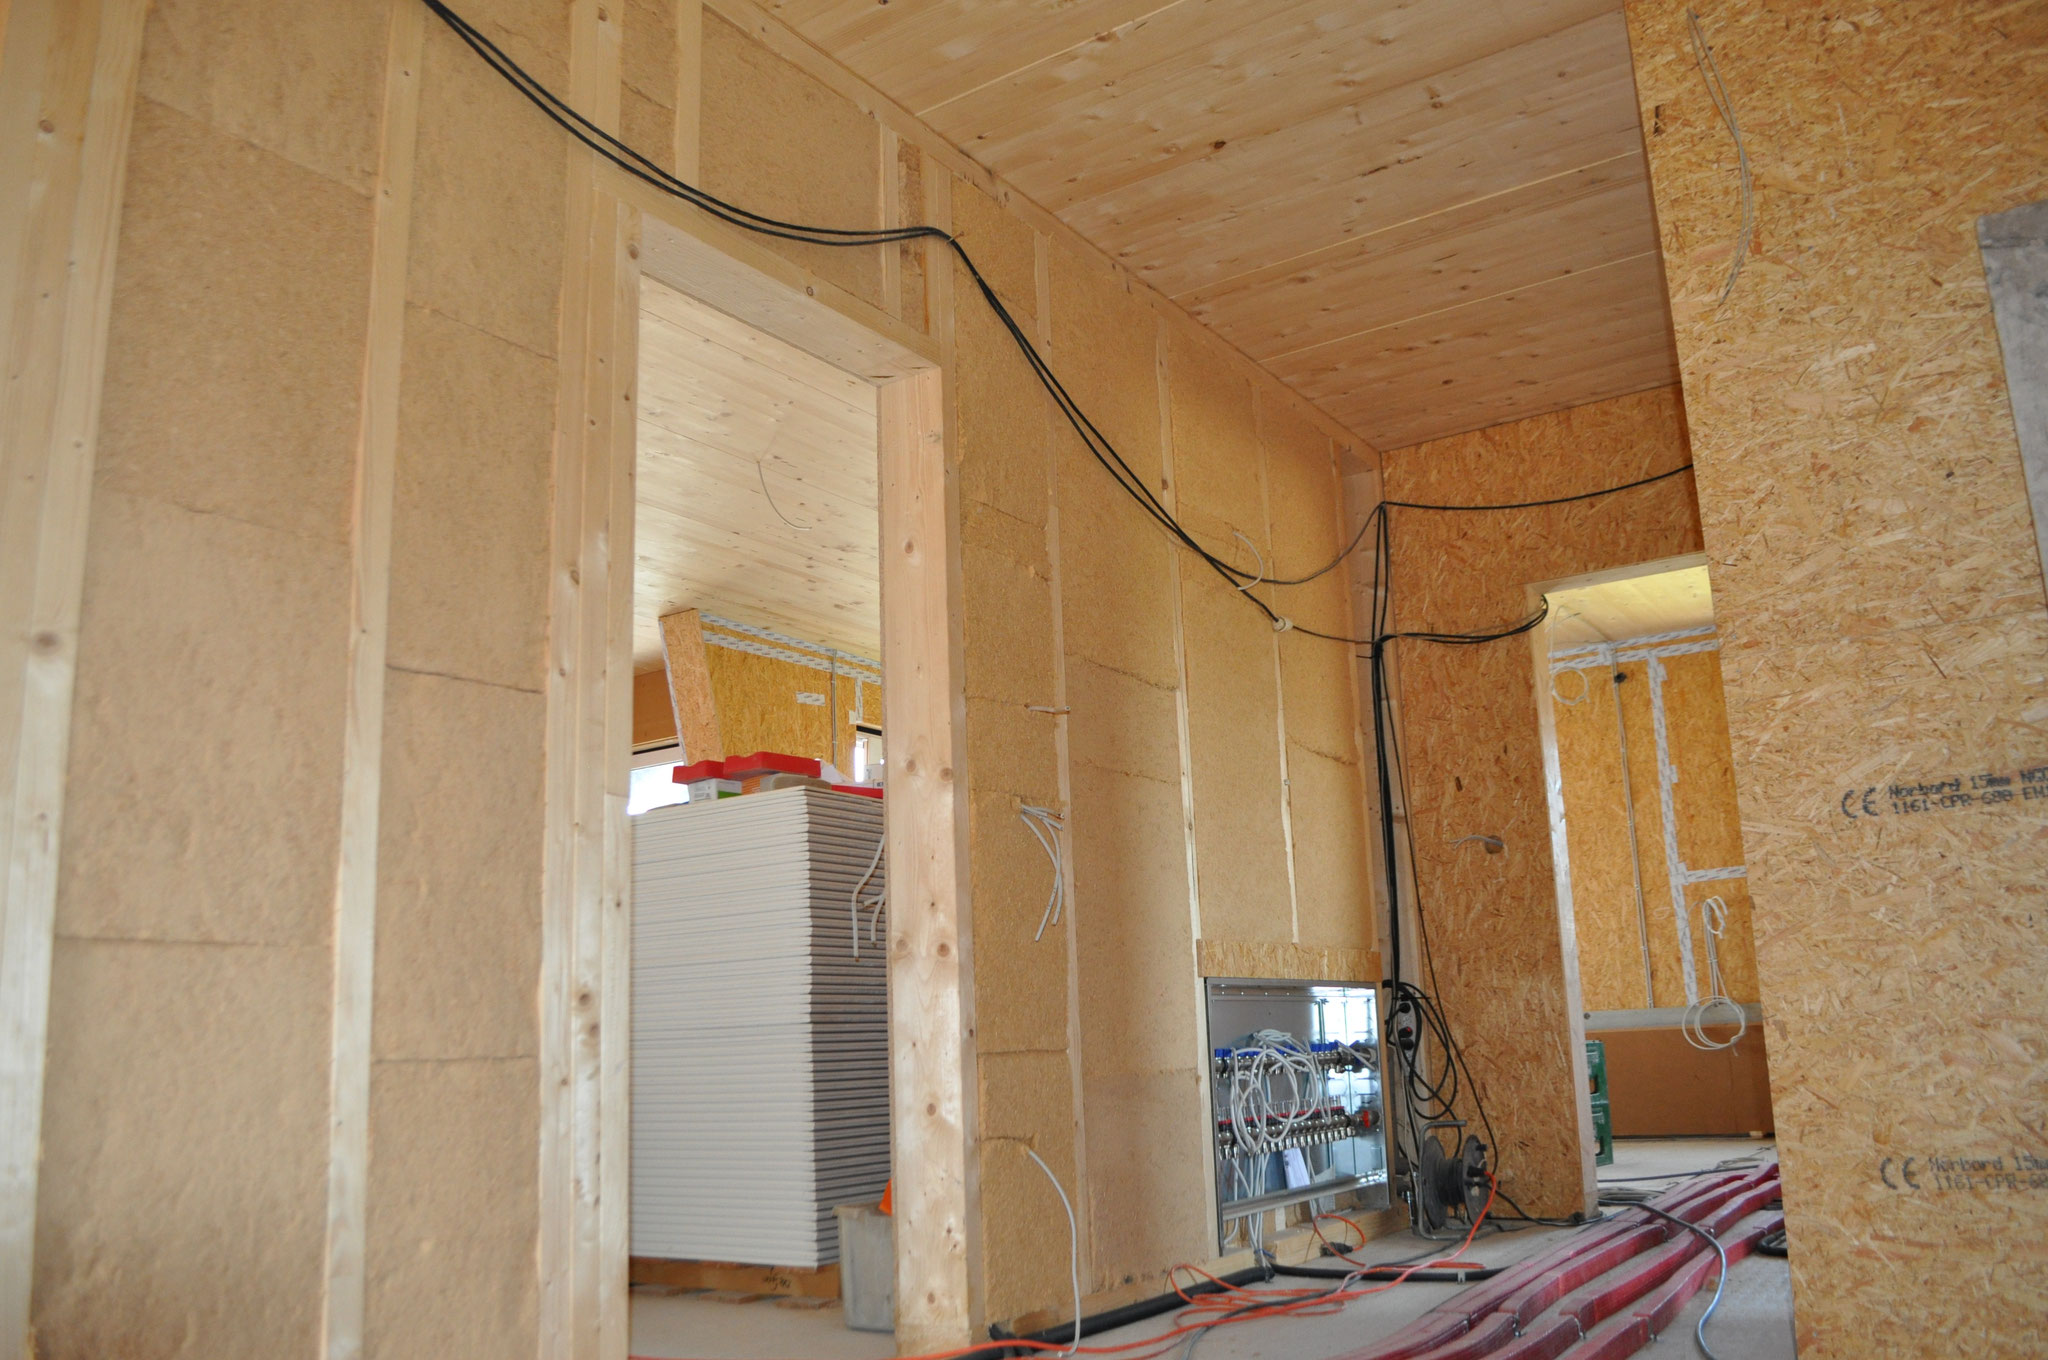 Innenwände Holzrahmenbau mit Brettholzstapeldecke